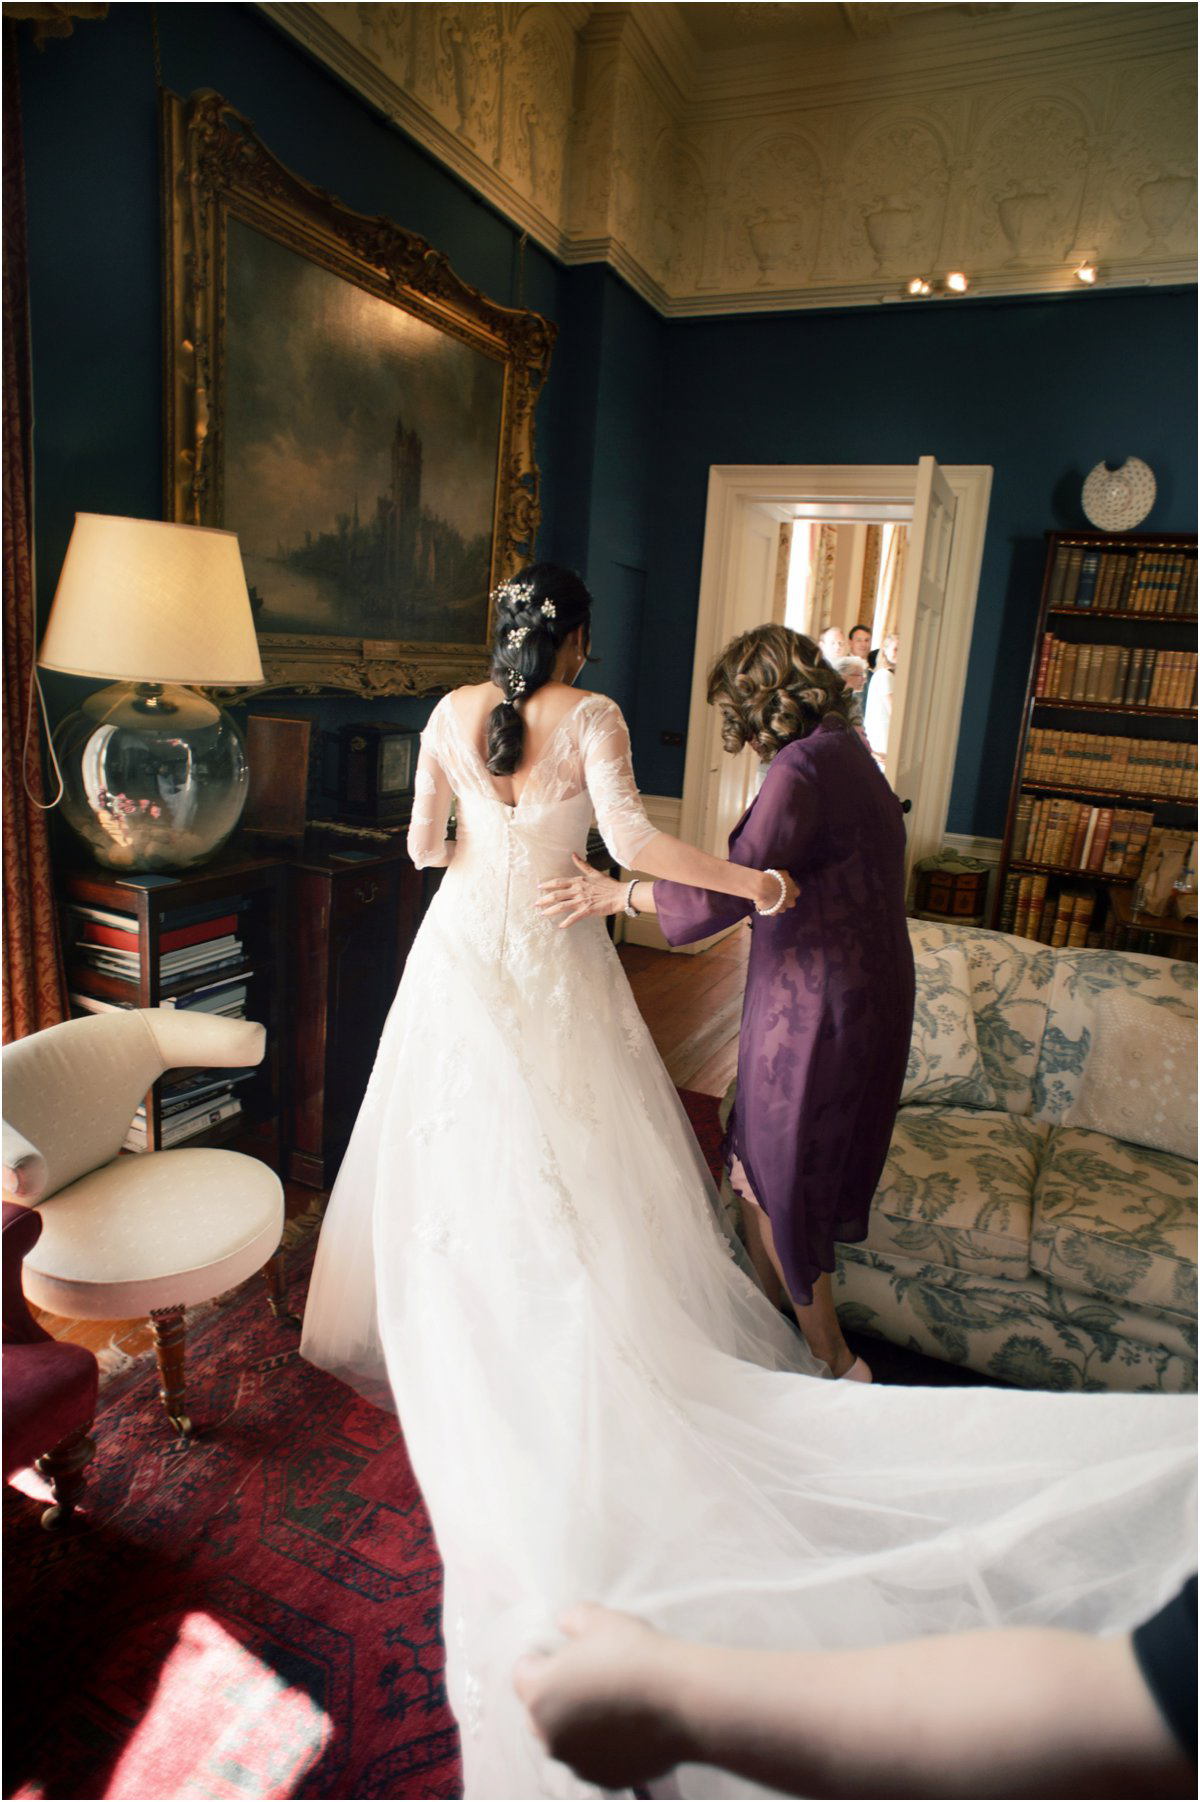 Crofts & Kowalczyk Best Wedding Photography Scotland Blogpost-25.jpg